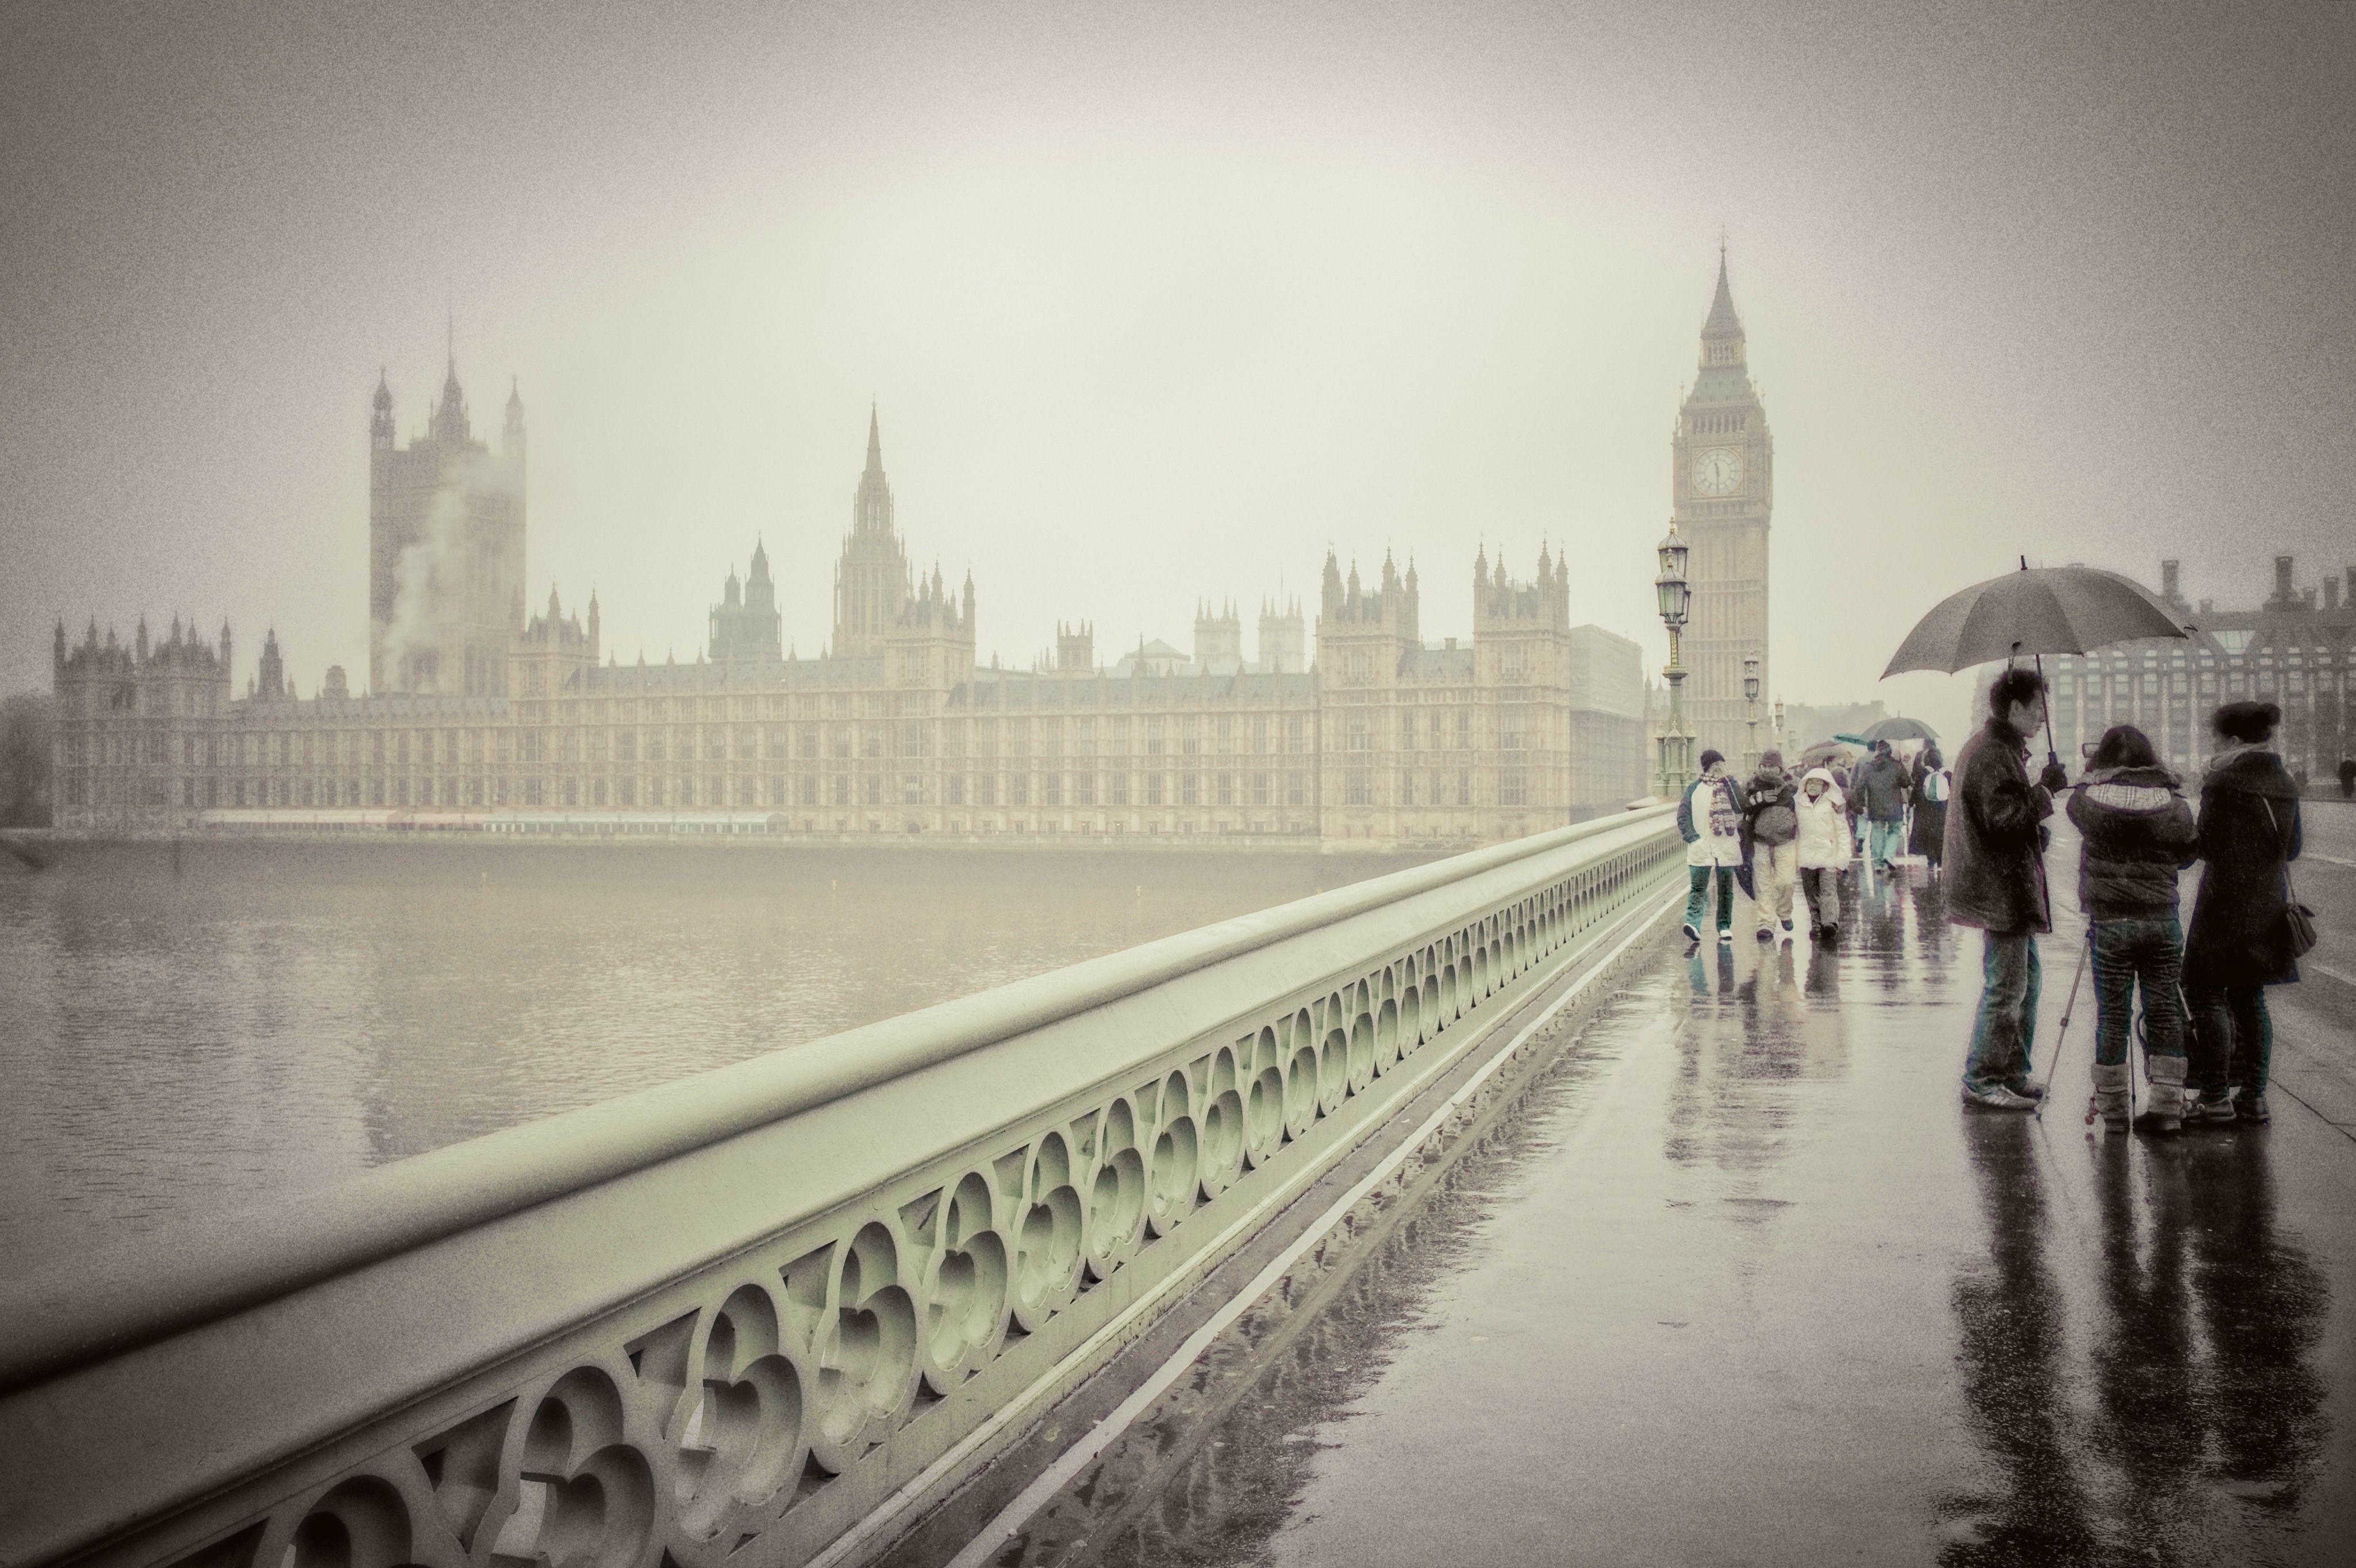 London Rain Wallpapers Top Free London Rain Backgrounds